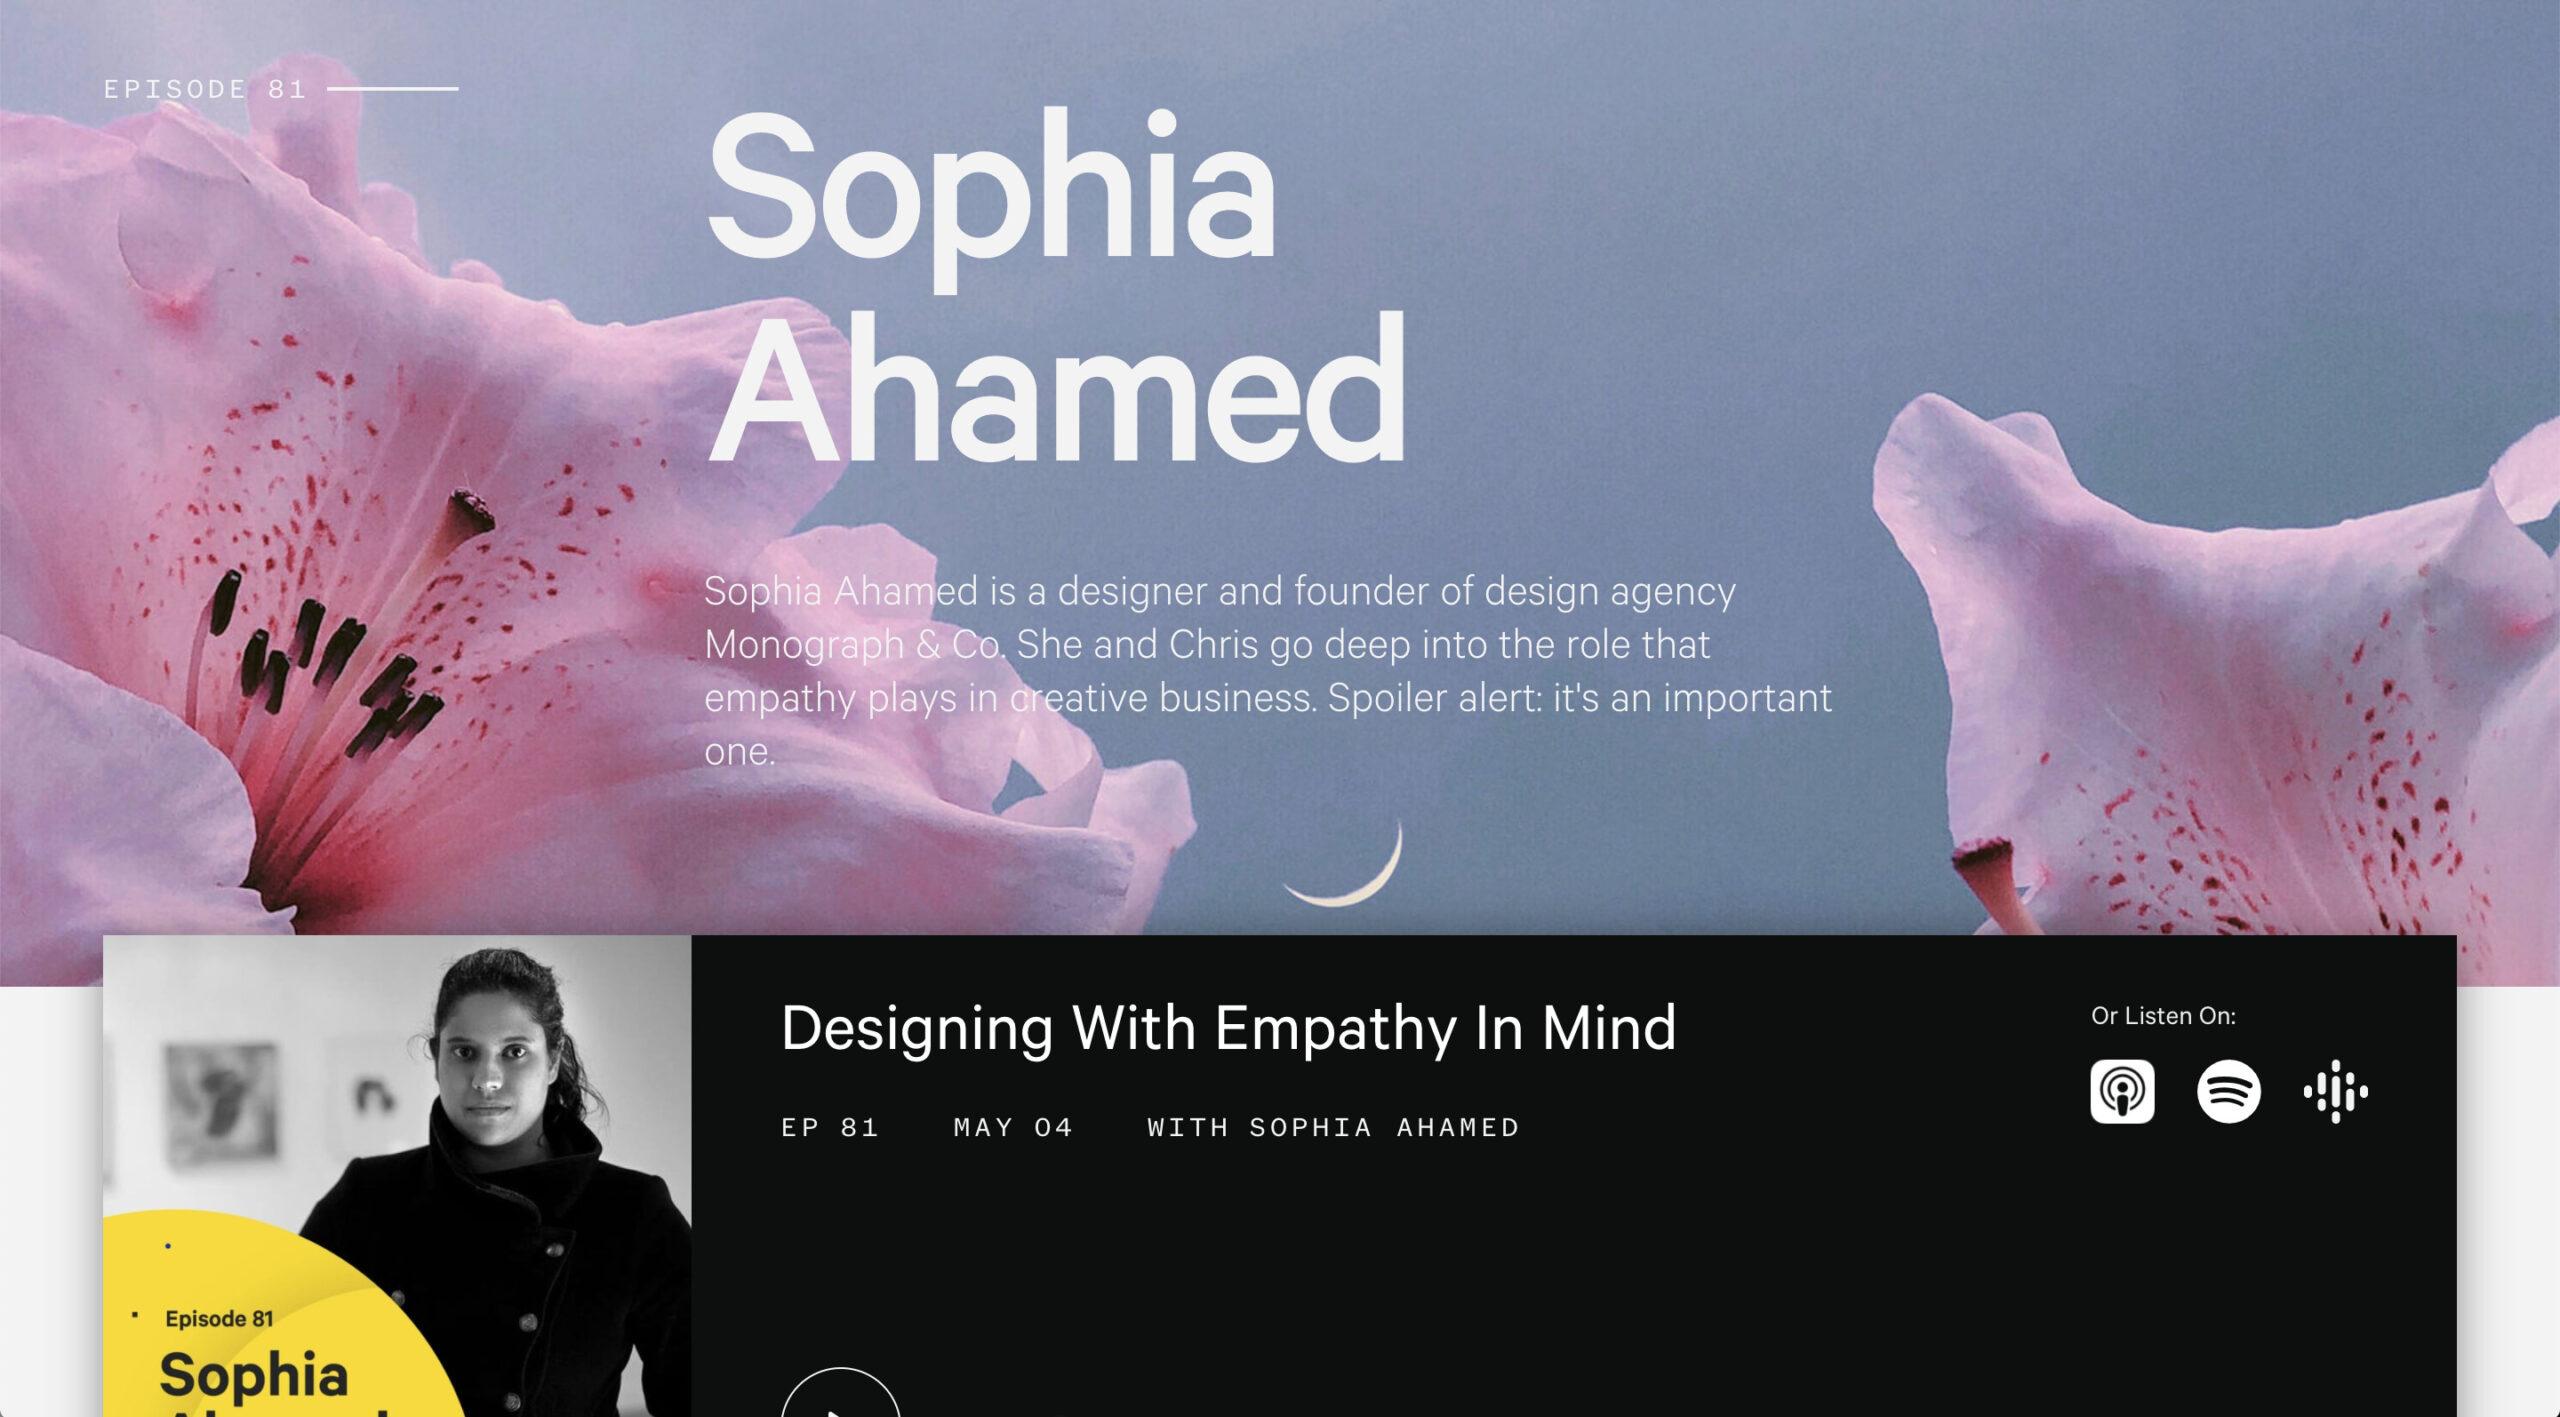 Episode 81- Designing with Empathy Sophia Ahamed The Futur